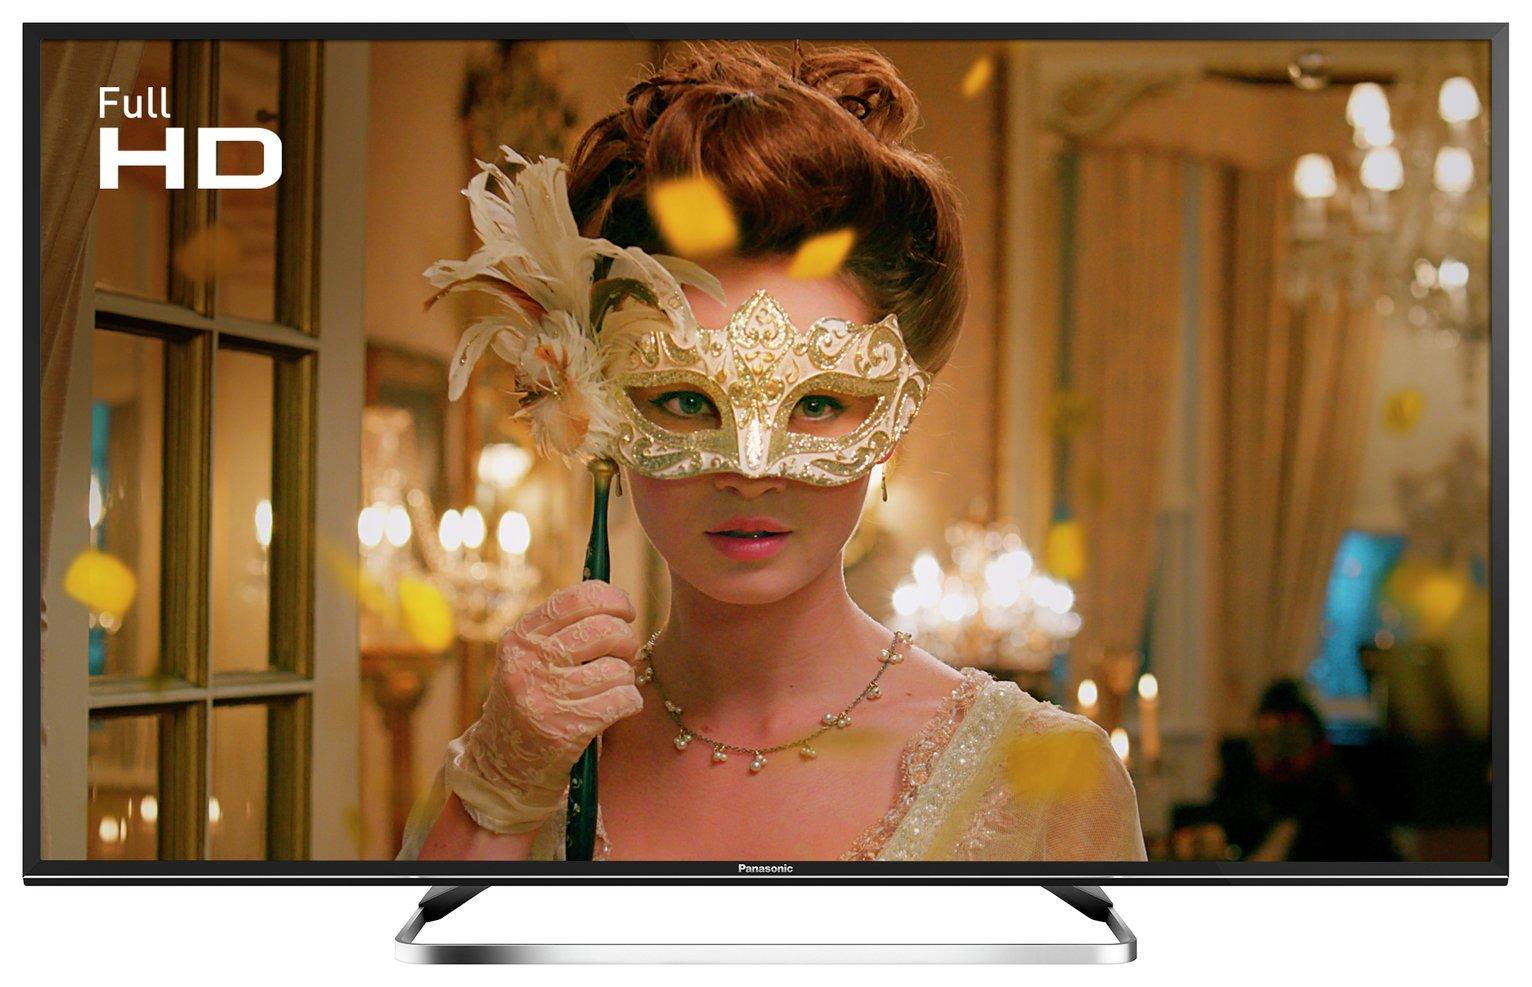 Panasonic TX-49ES500B 49 Inch Full HD Smart TV